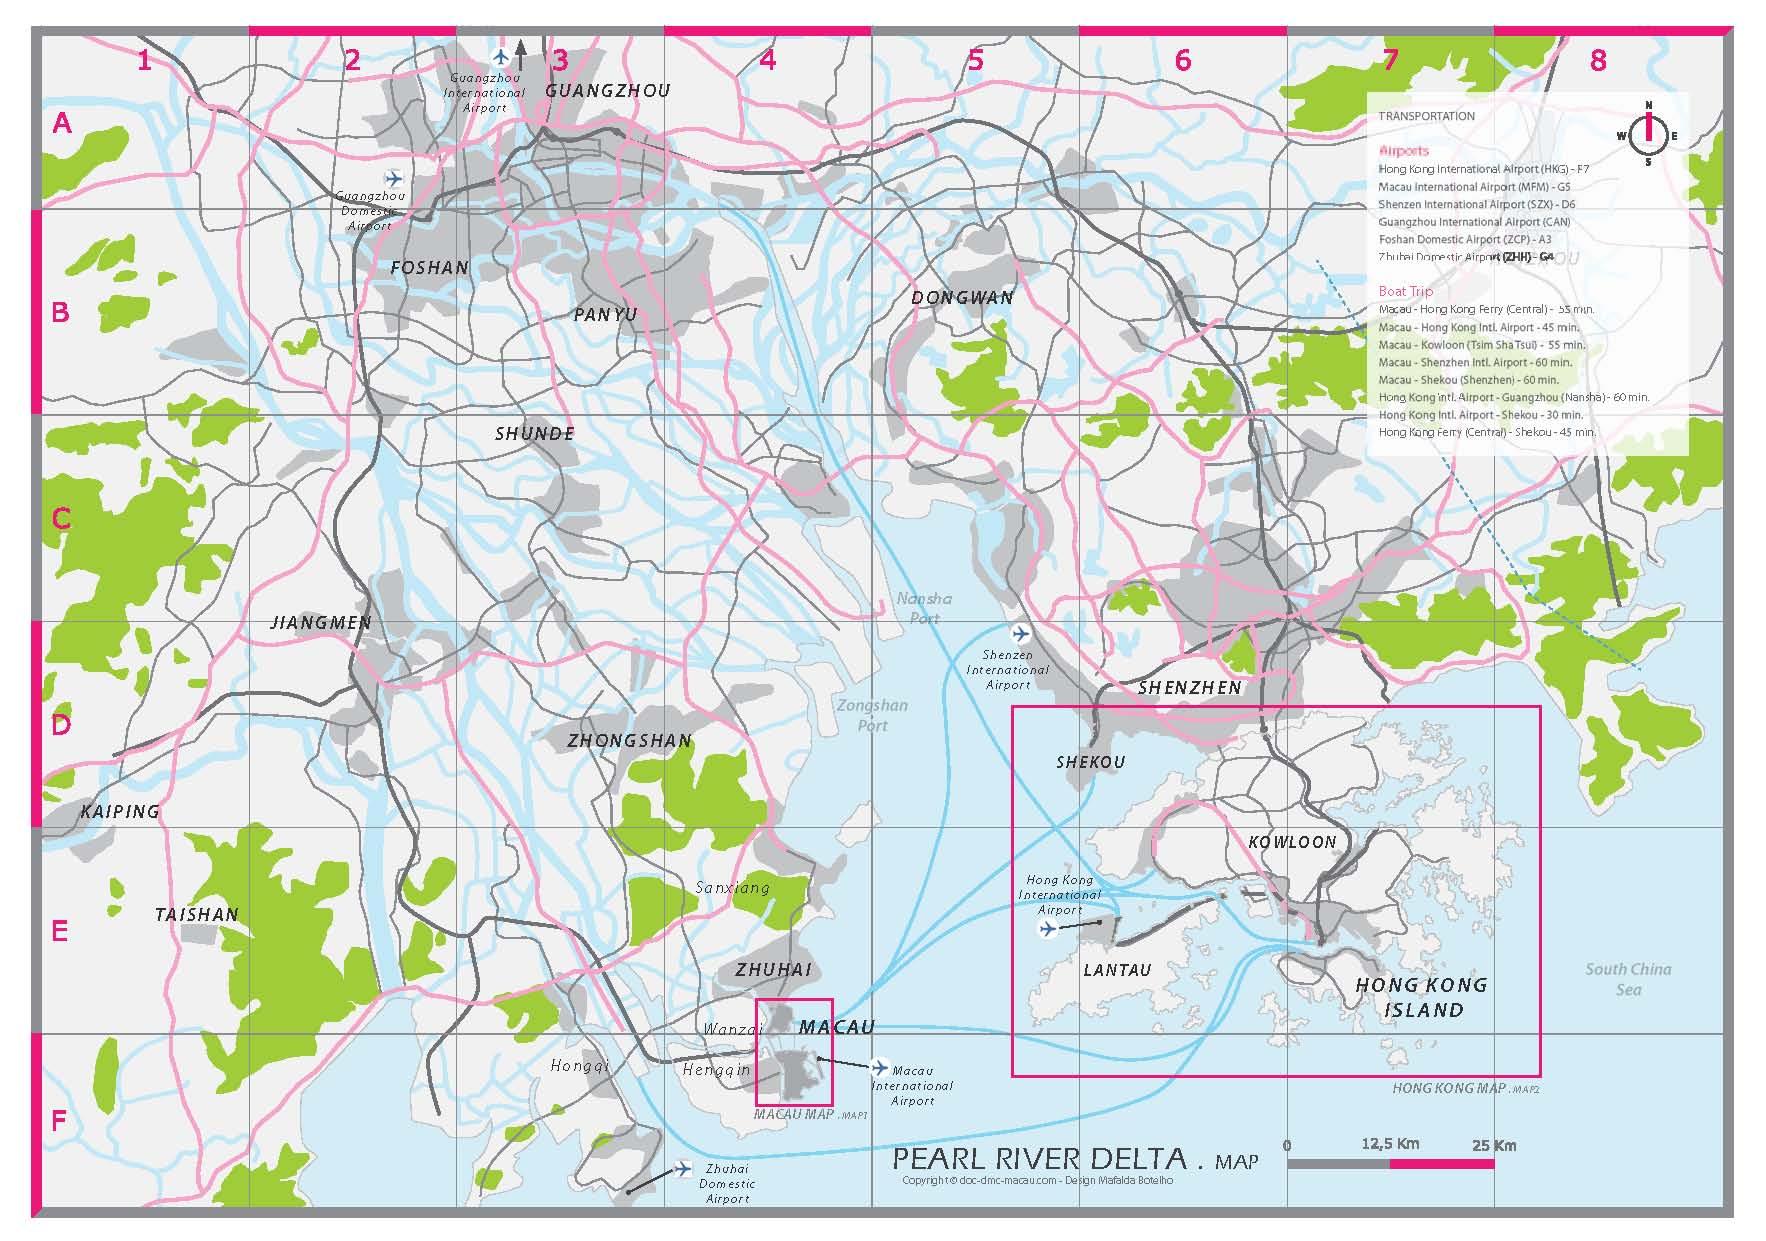 Pearl River Delta Map (Hong Kong, Macau, Zhuhai)